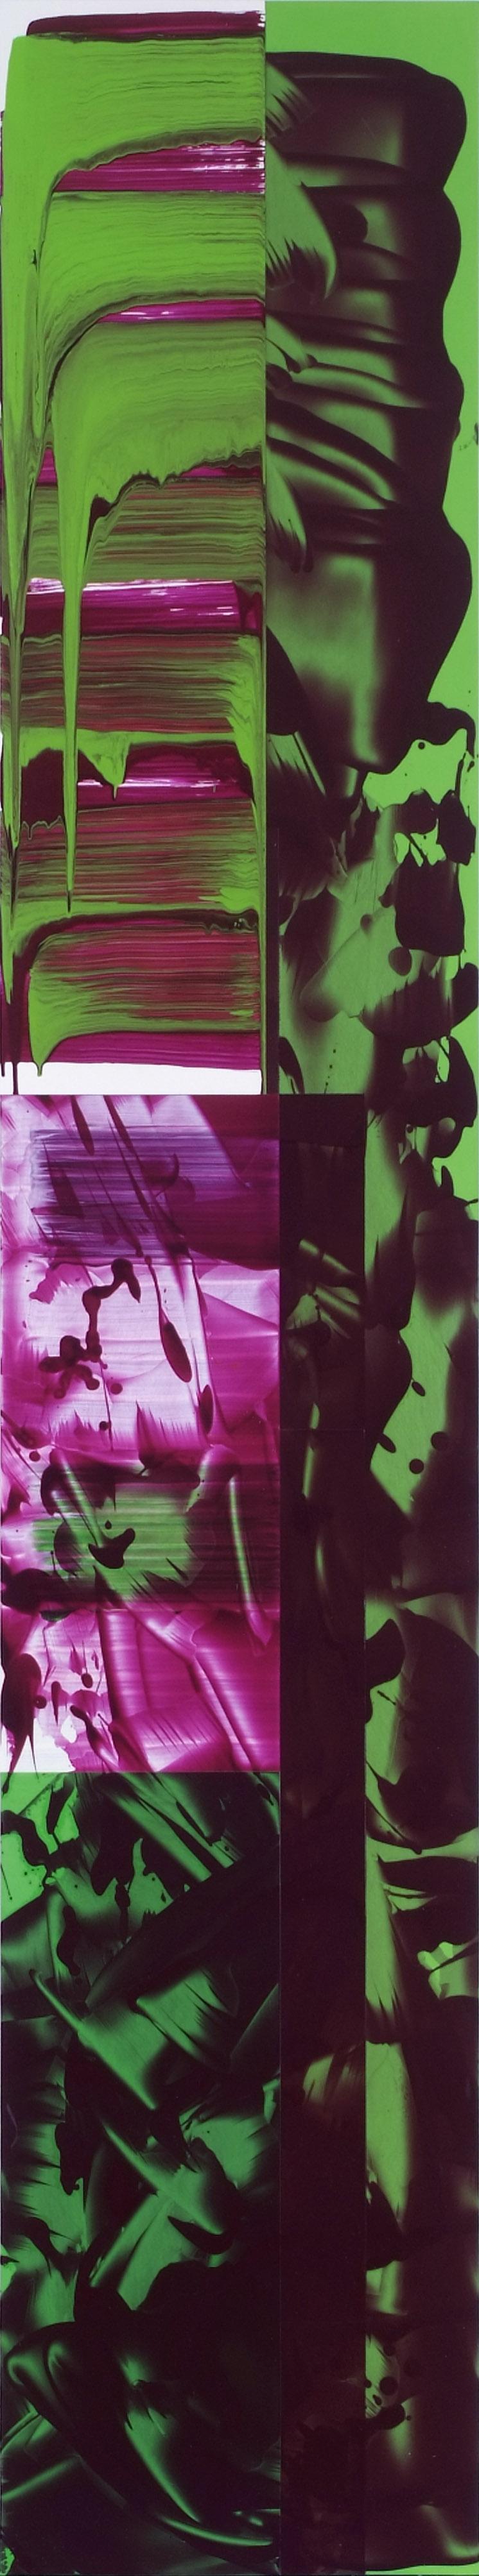 592 | 2007-09 | Öl und Acryl auf Leinwand | 242 x 46 cm